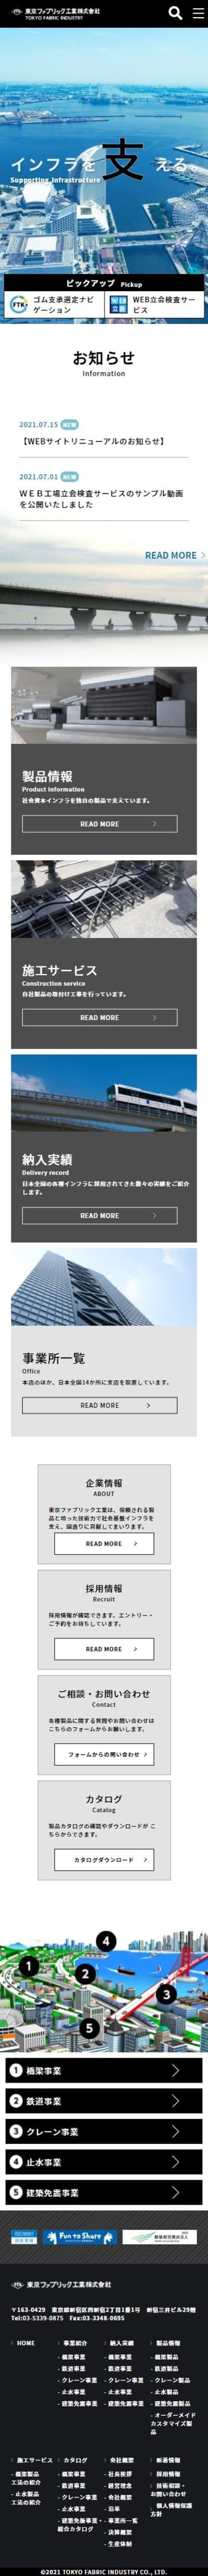 TOKYO FABURIC INDUSTRY